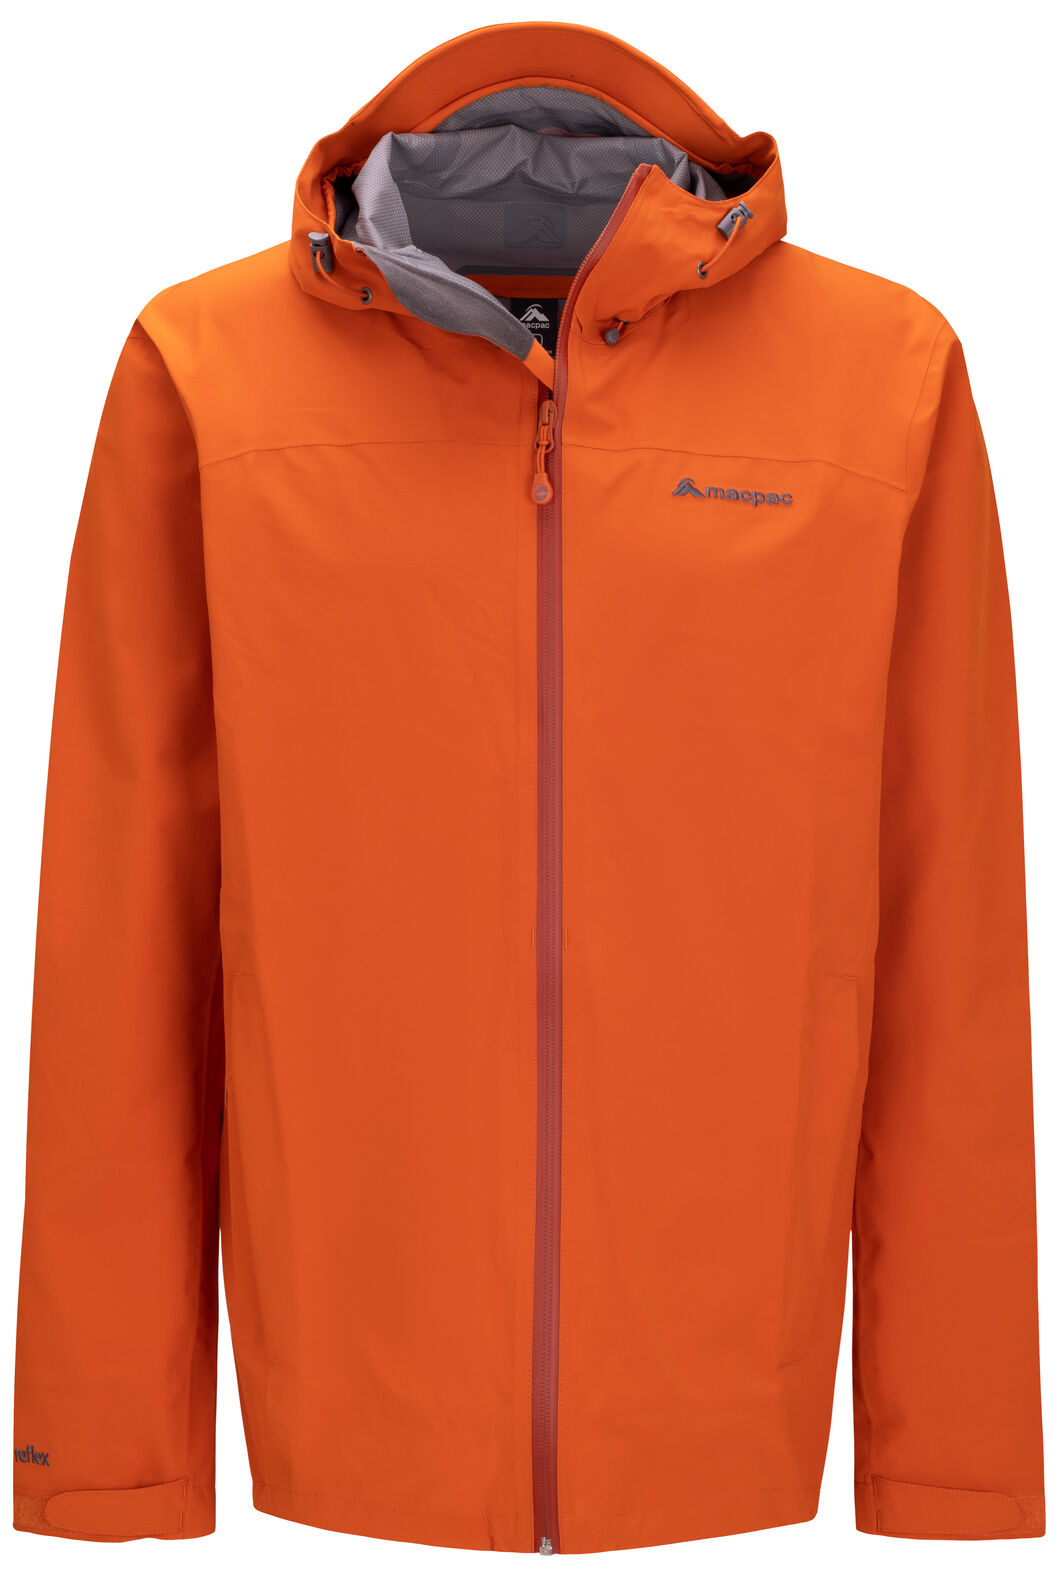 Macpac Men's Dispatch Rain Jacket, Orange Flame, hi-res